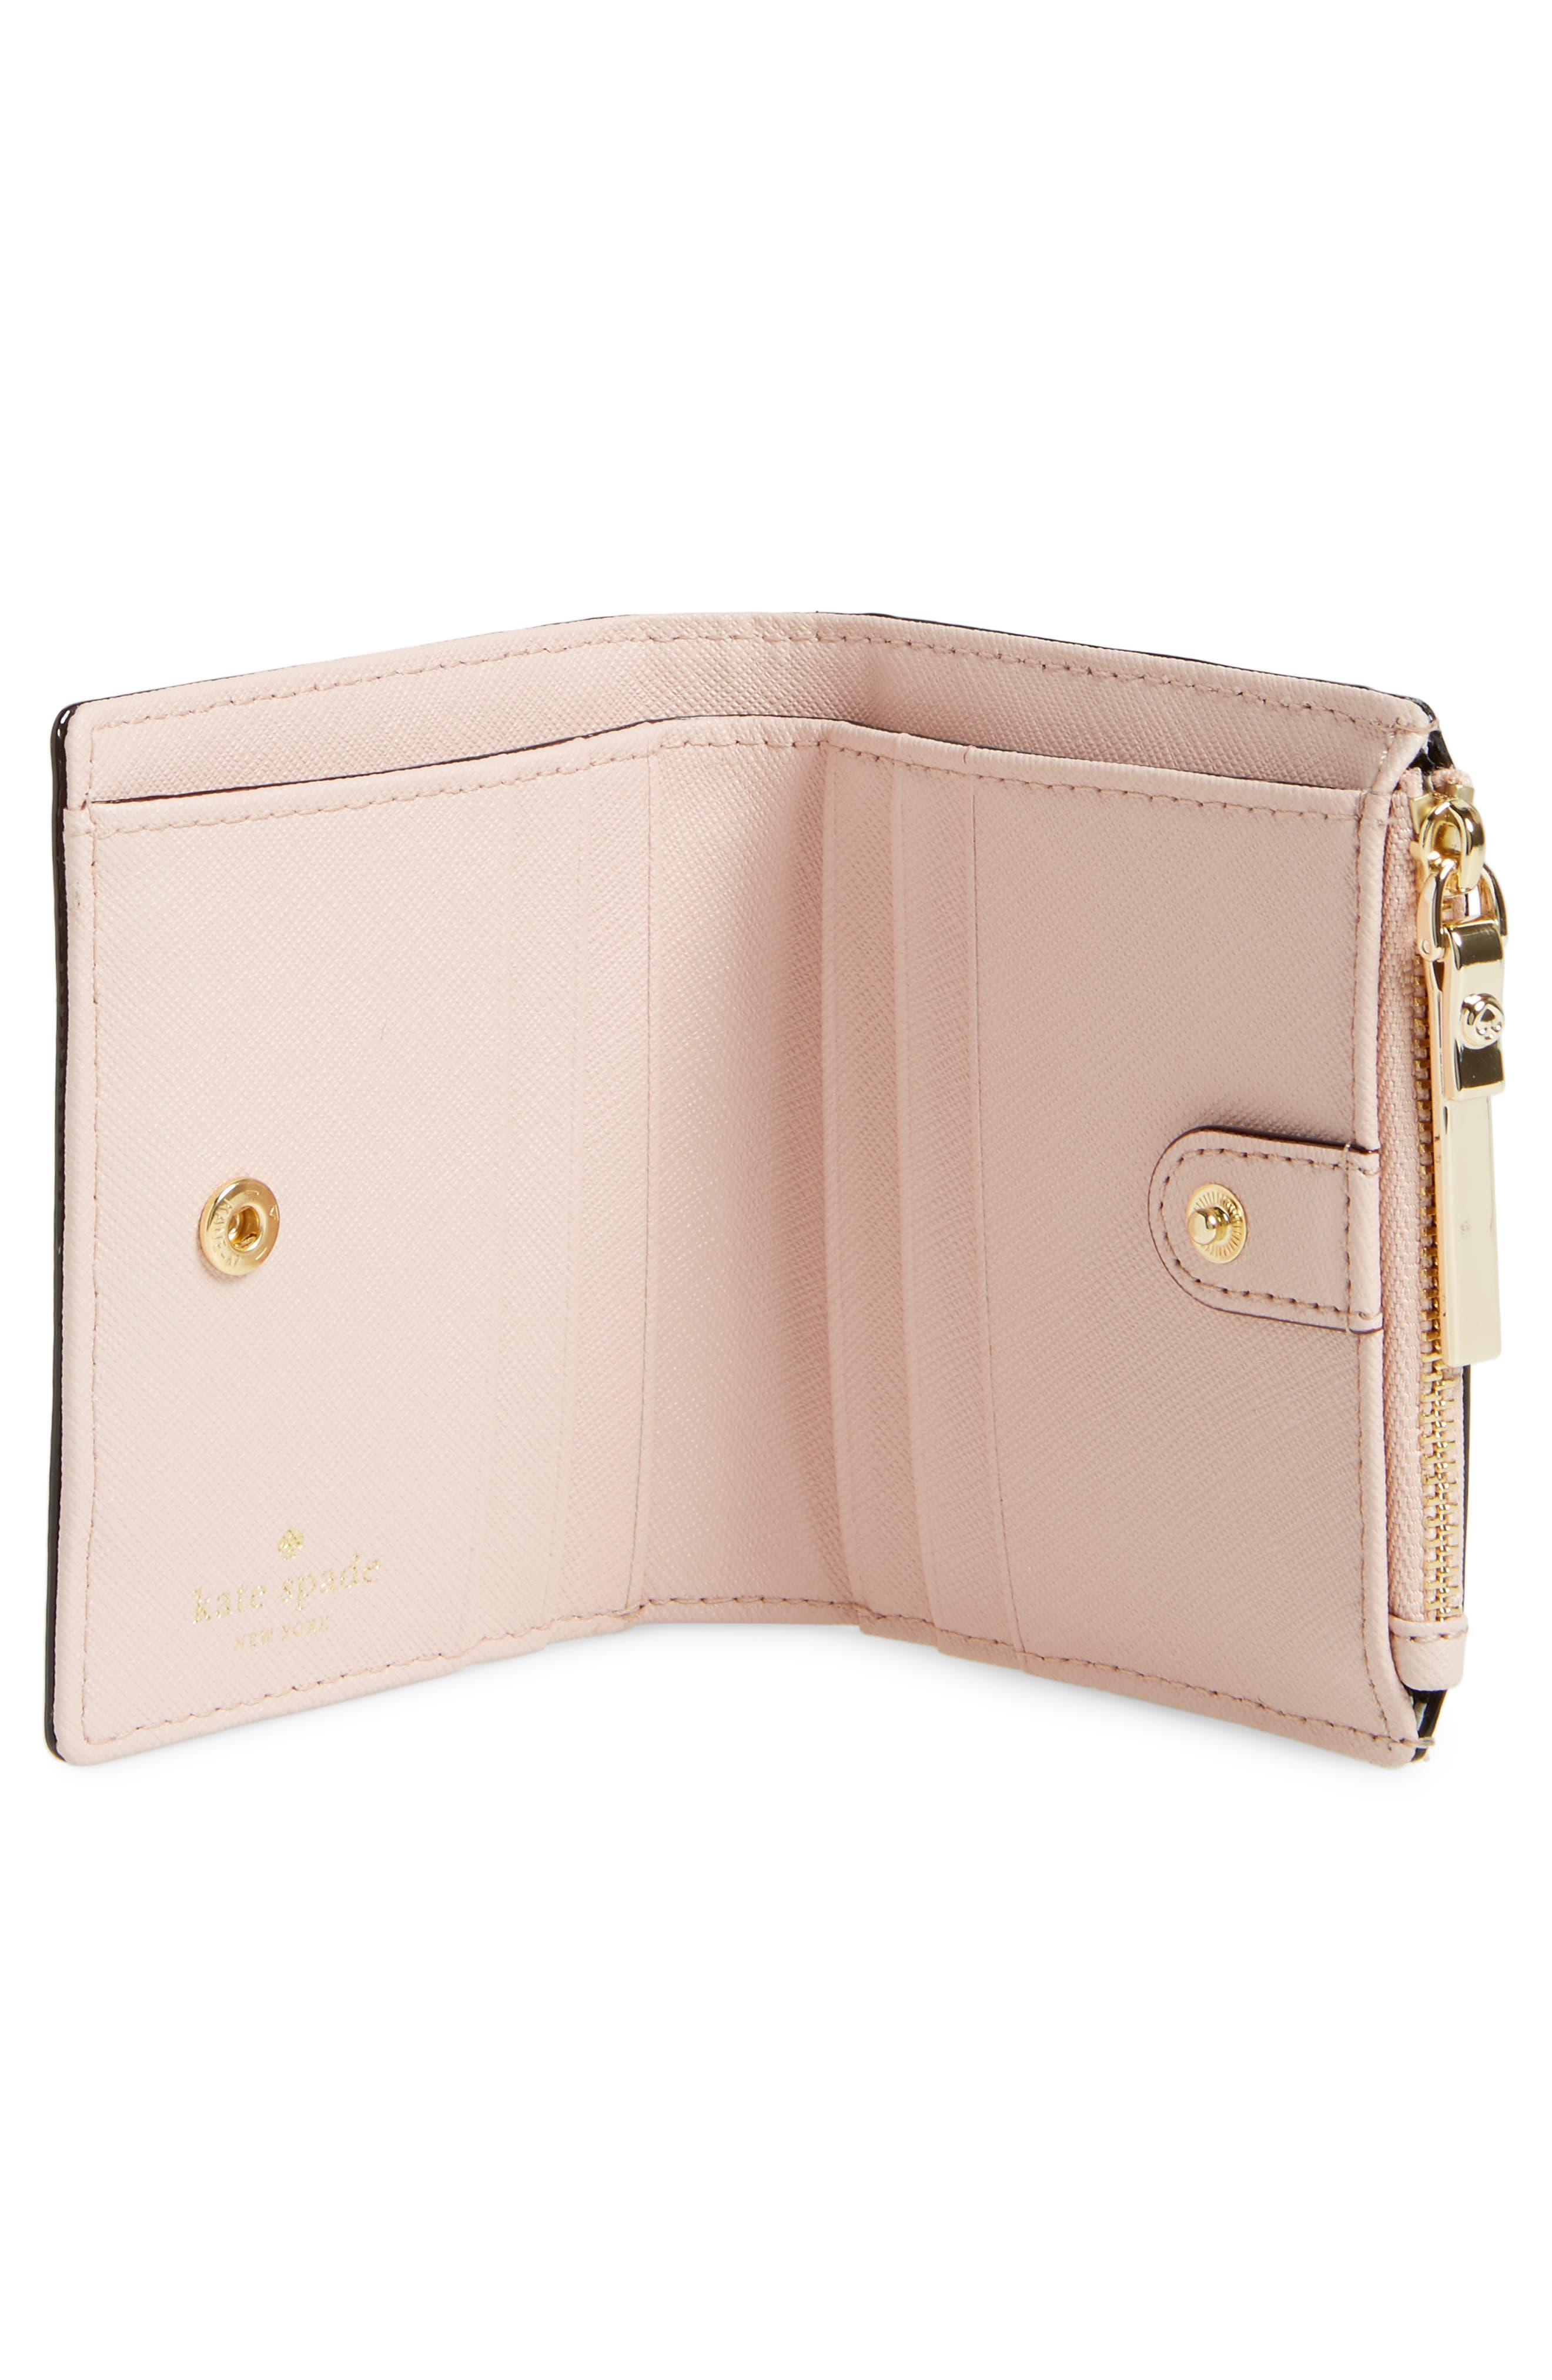 cameron street - adalyn slim leather wallet,                             Alternate thumbnail 2, color,                             Warm Vellum